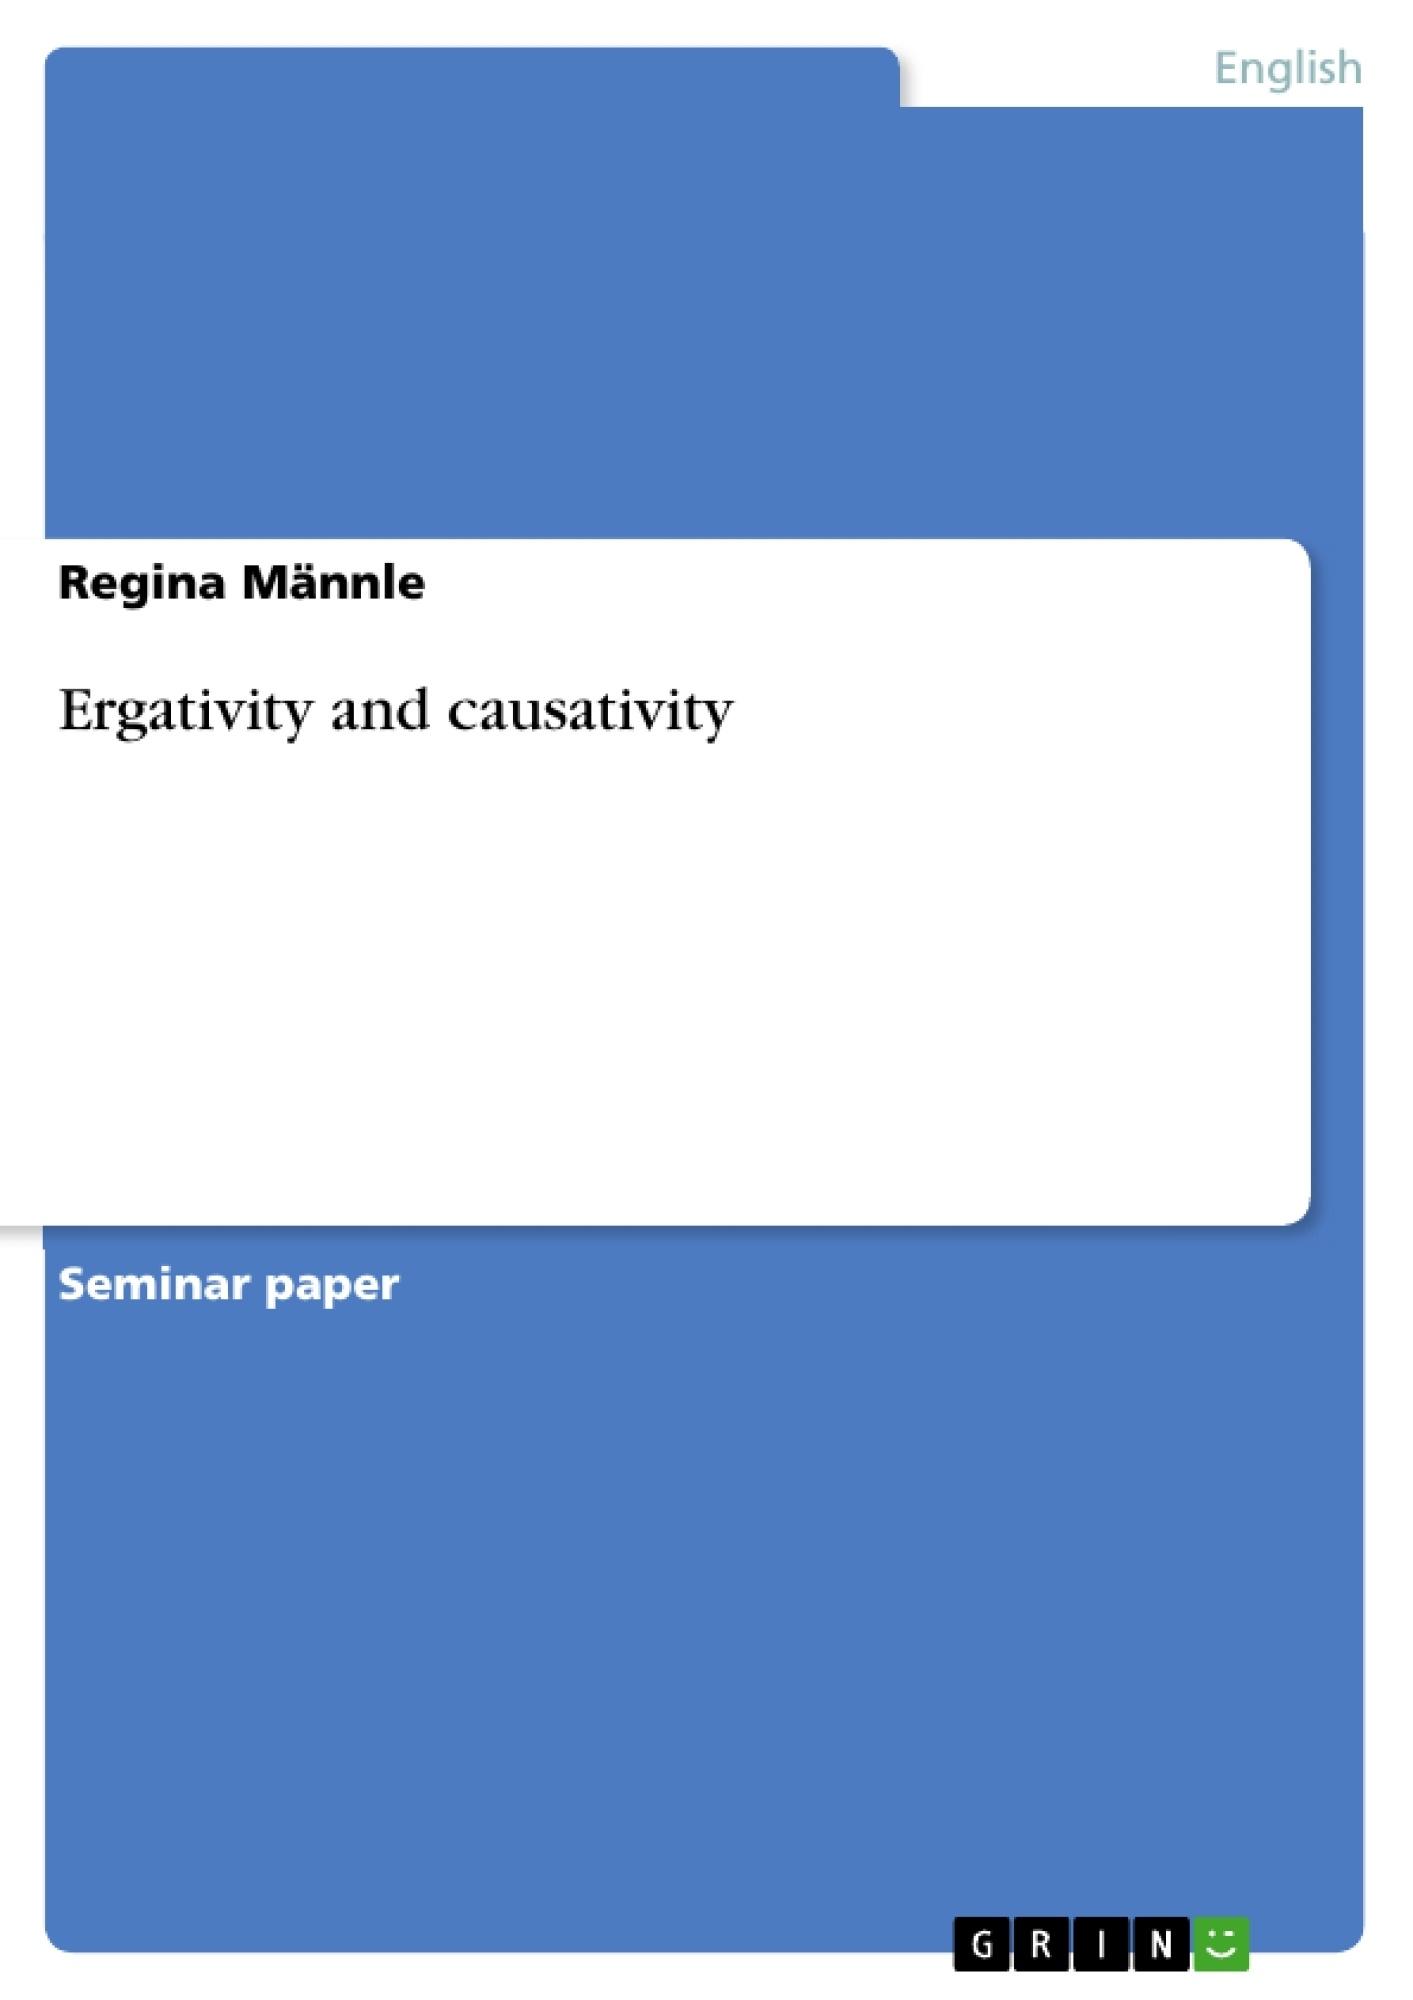 Title: Ergativity and causativity